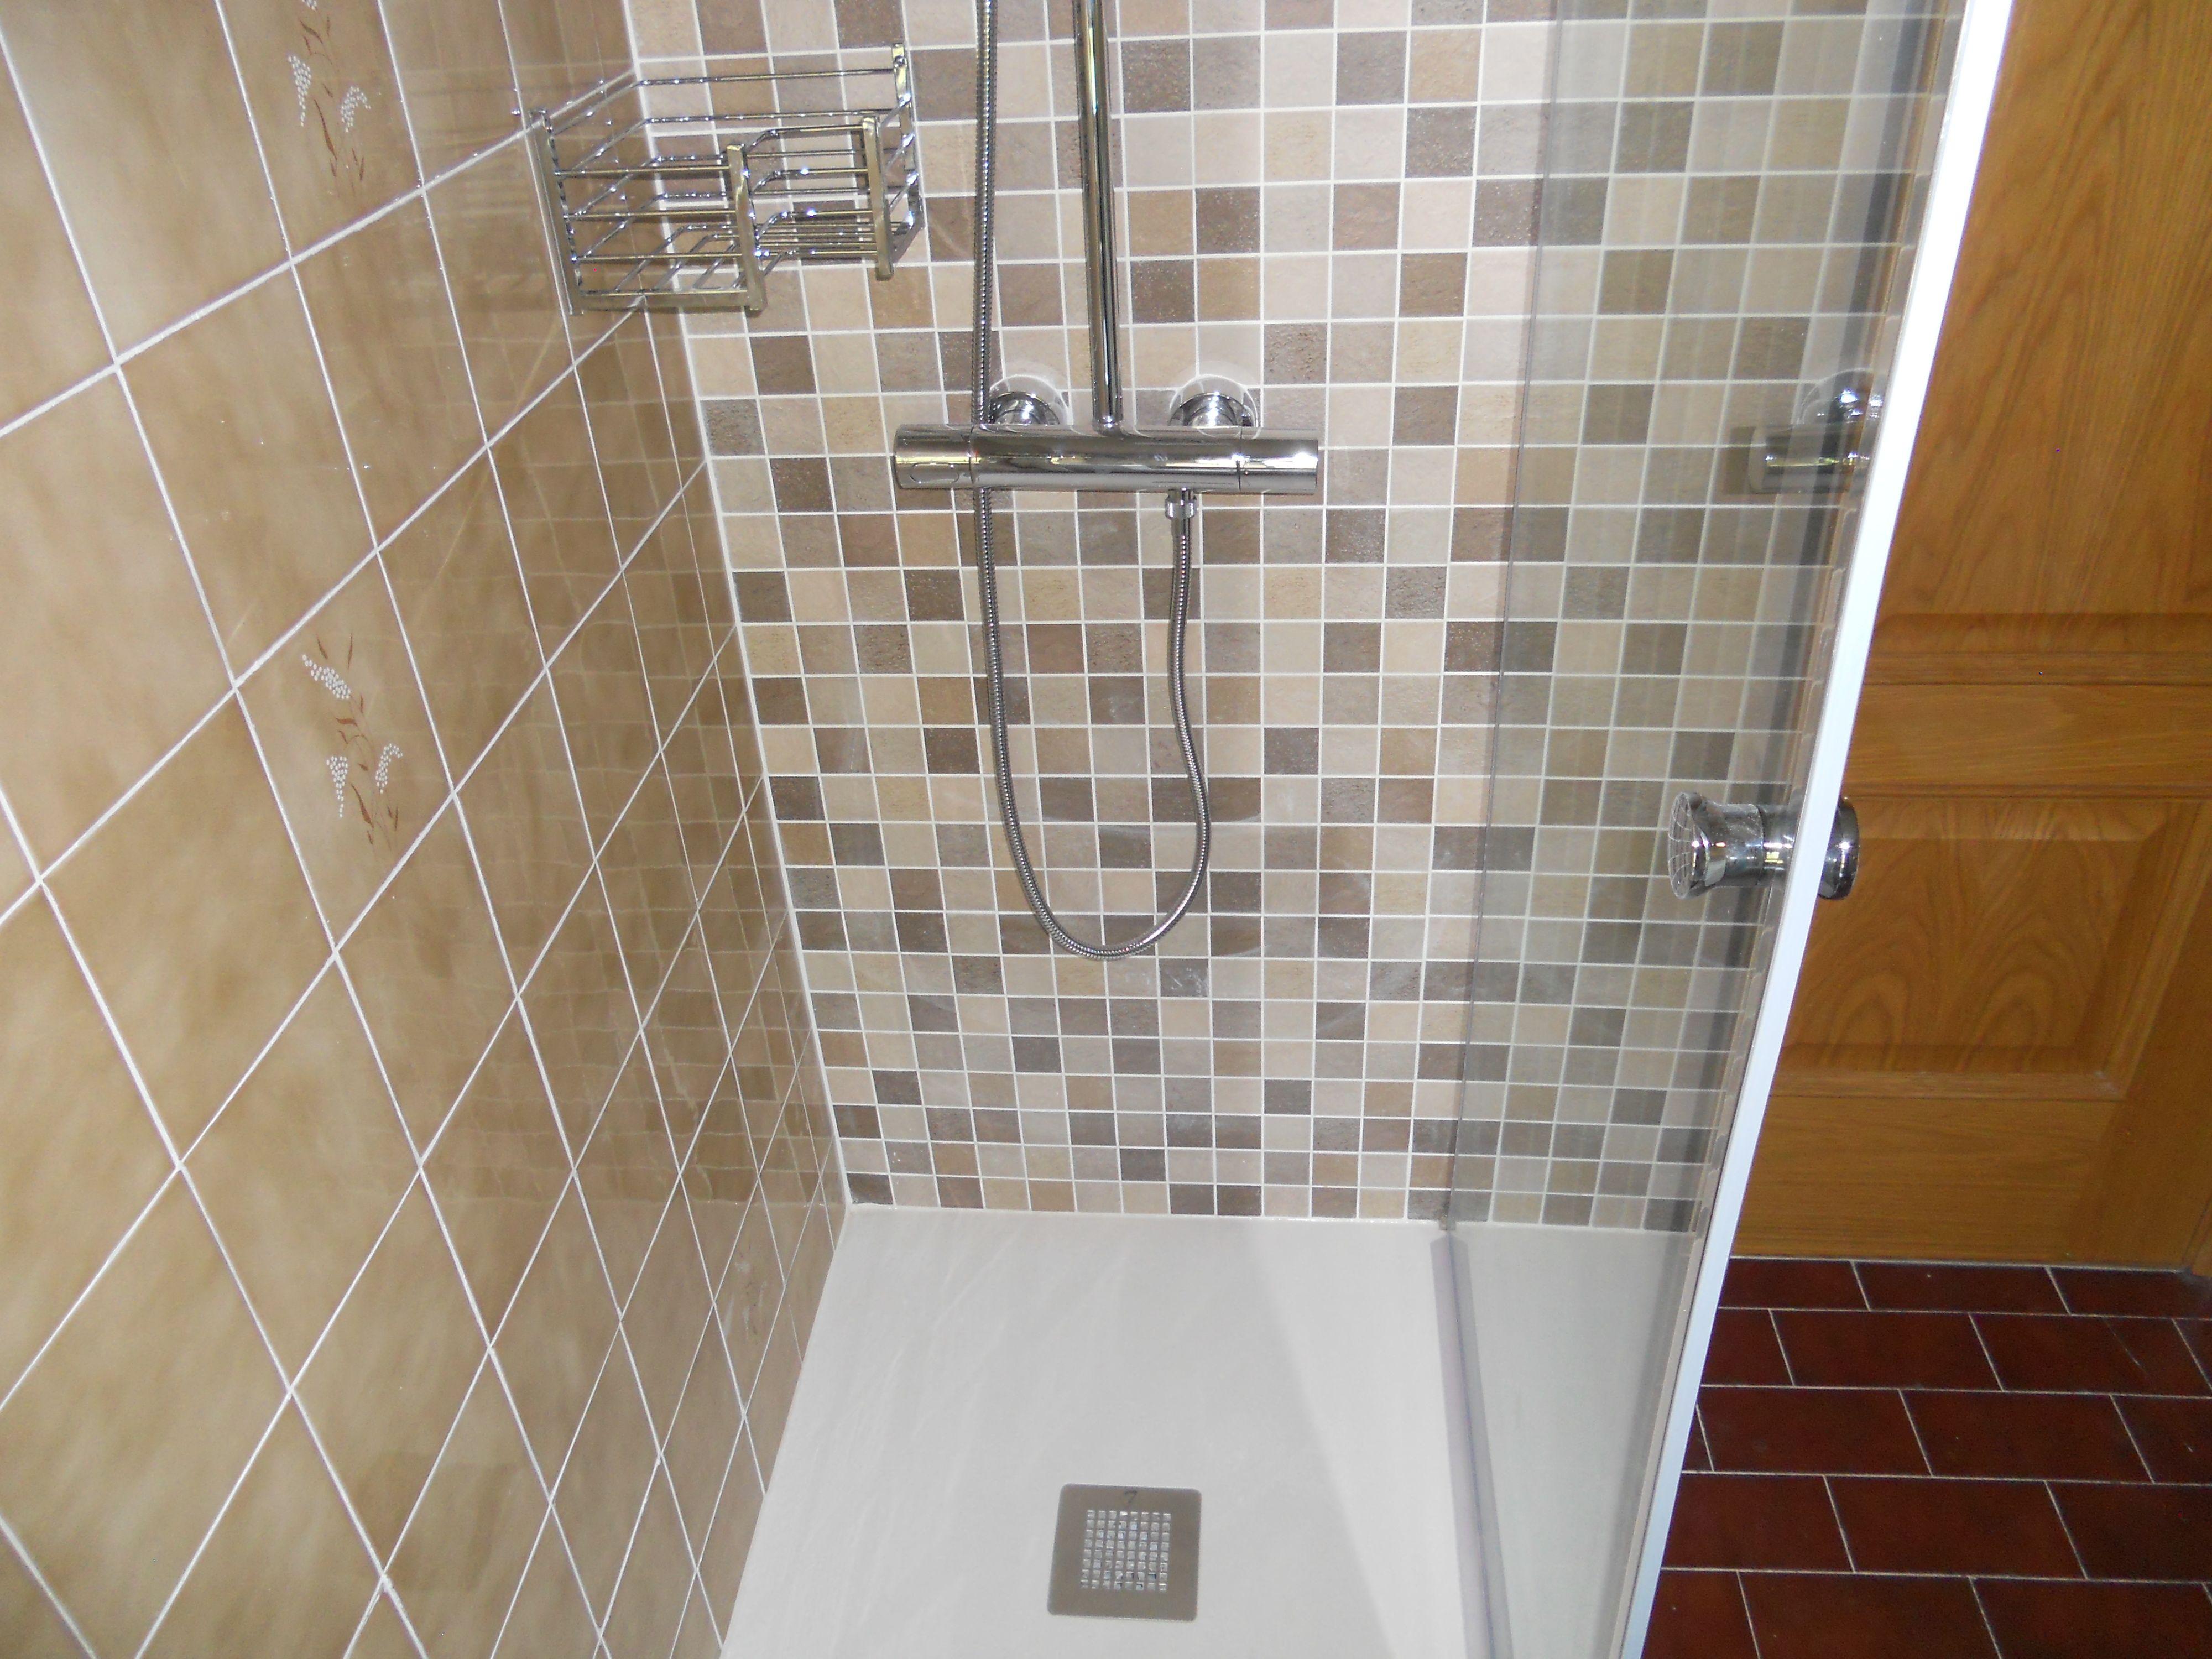 azulejos baño - Buscar con Google | 5recycle AZULEJOS ARTISTICOS ...